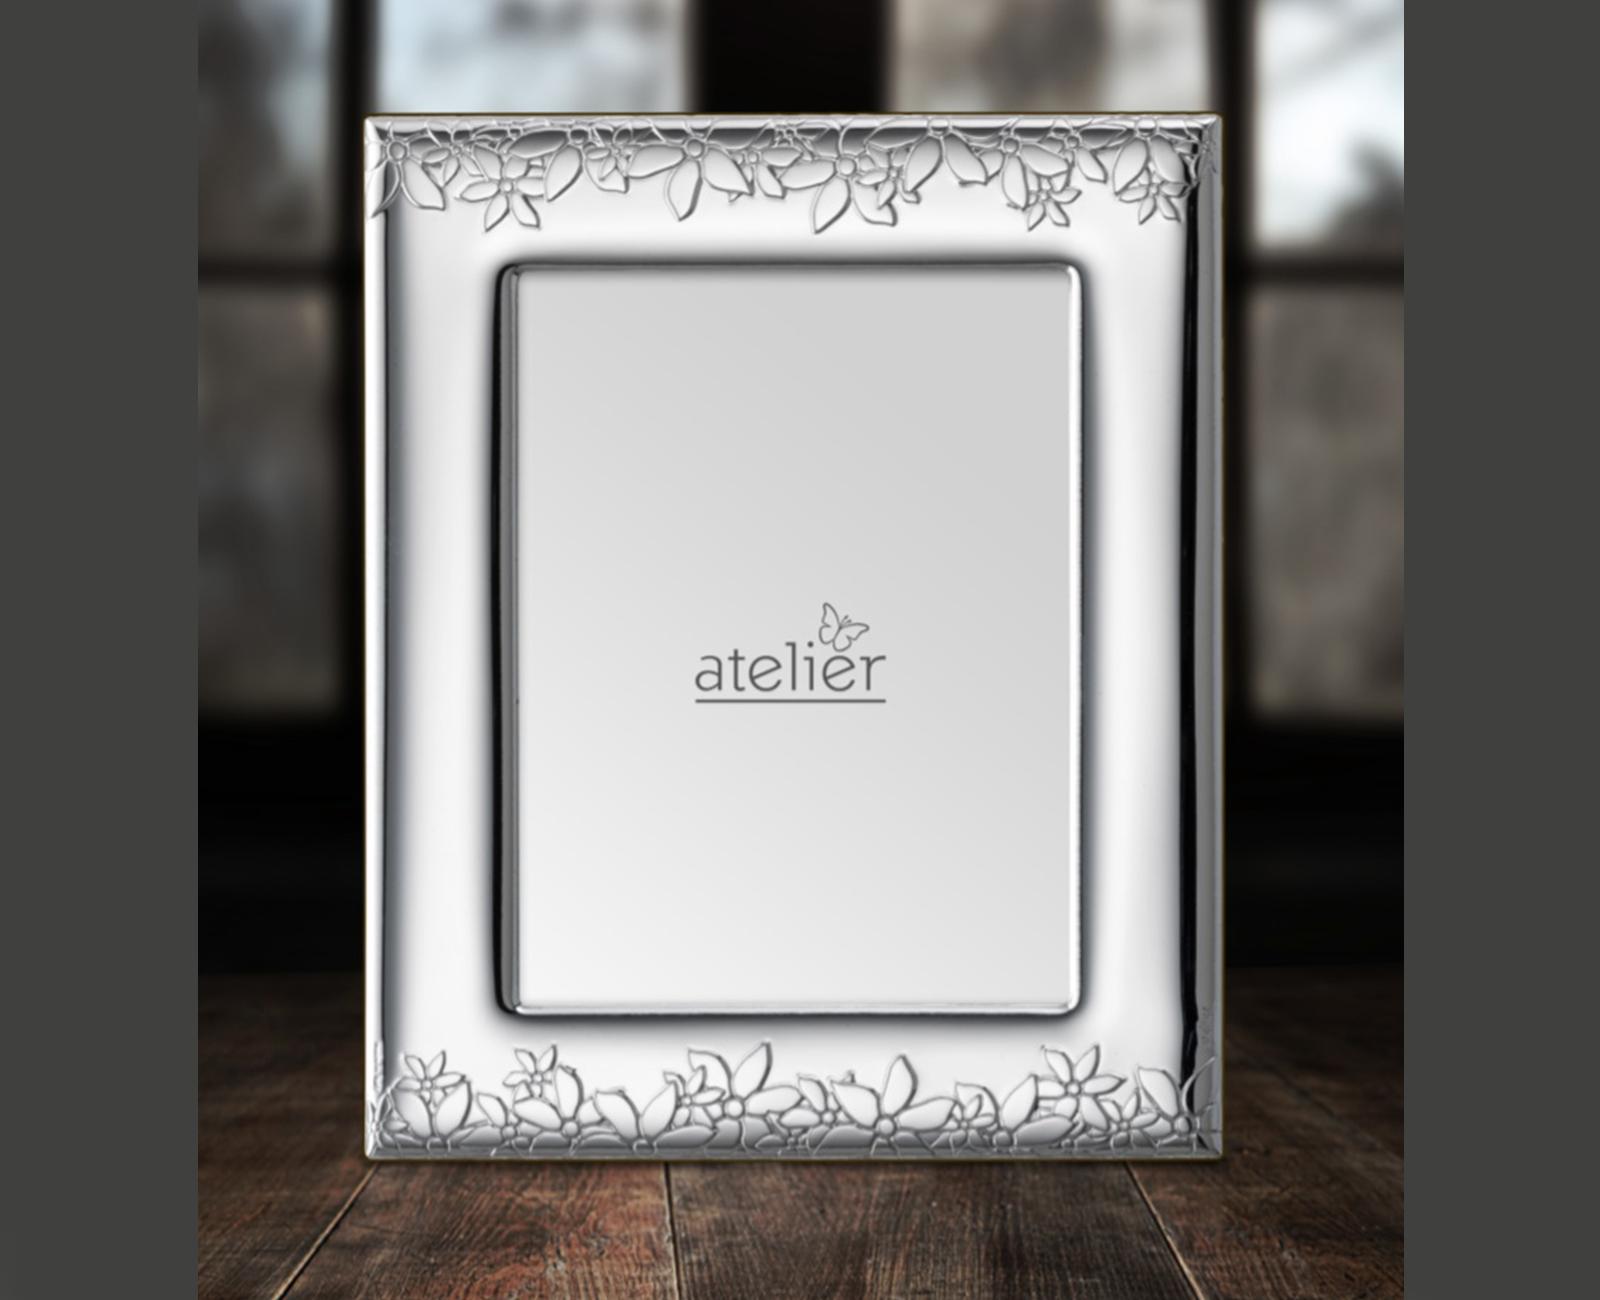 Atelier Cornice Portafoto Argento Ref. AE0116 9x13 13x18